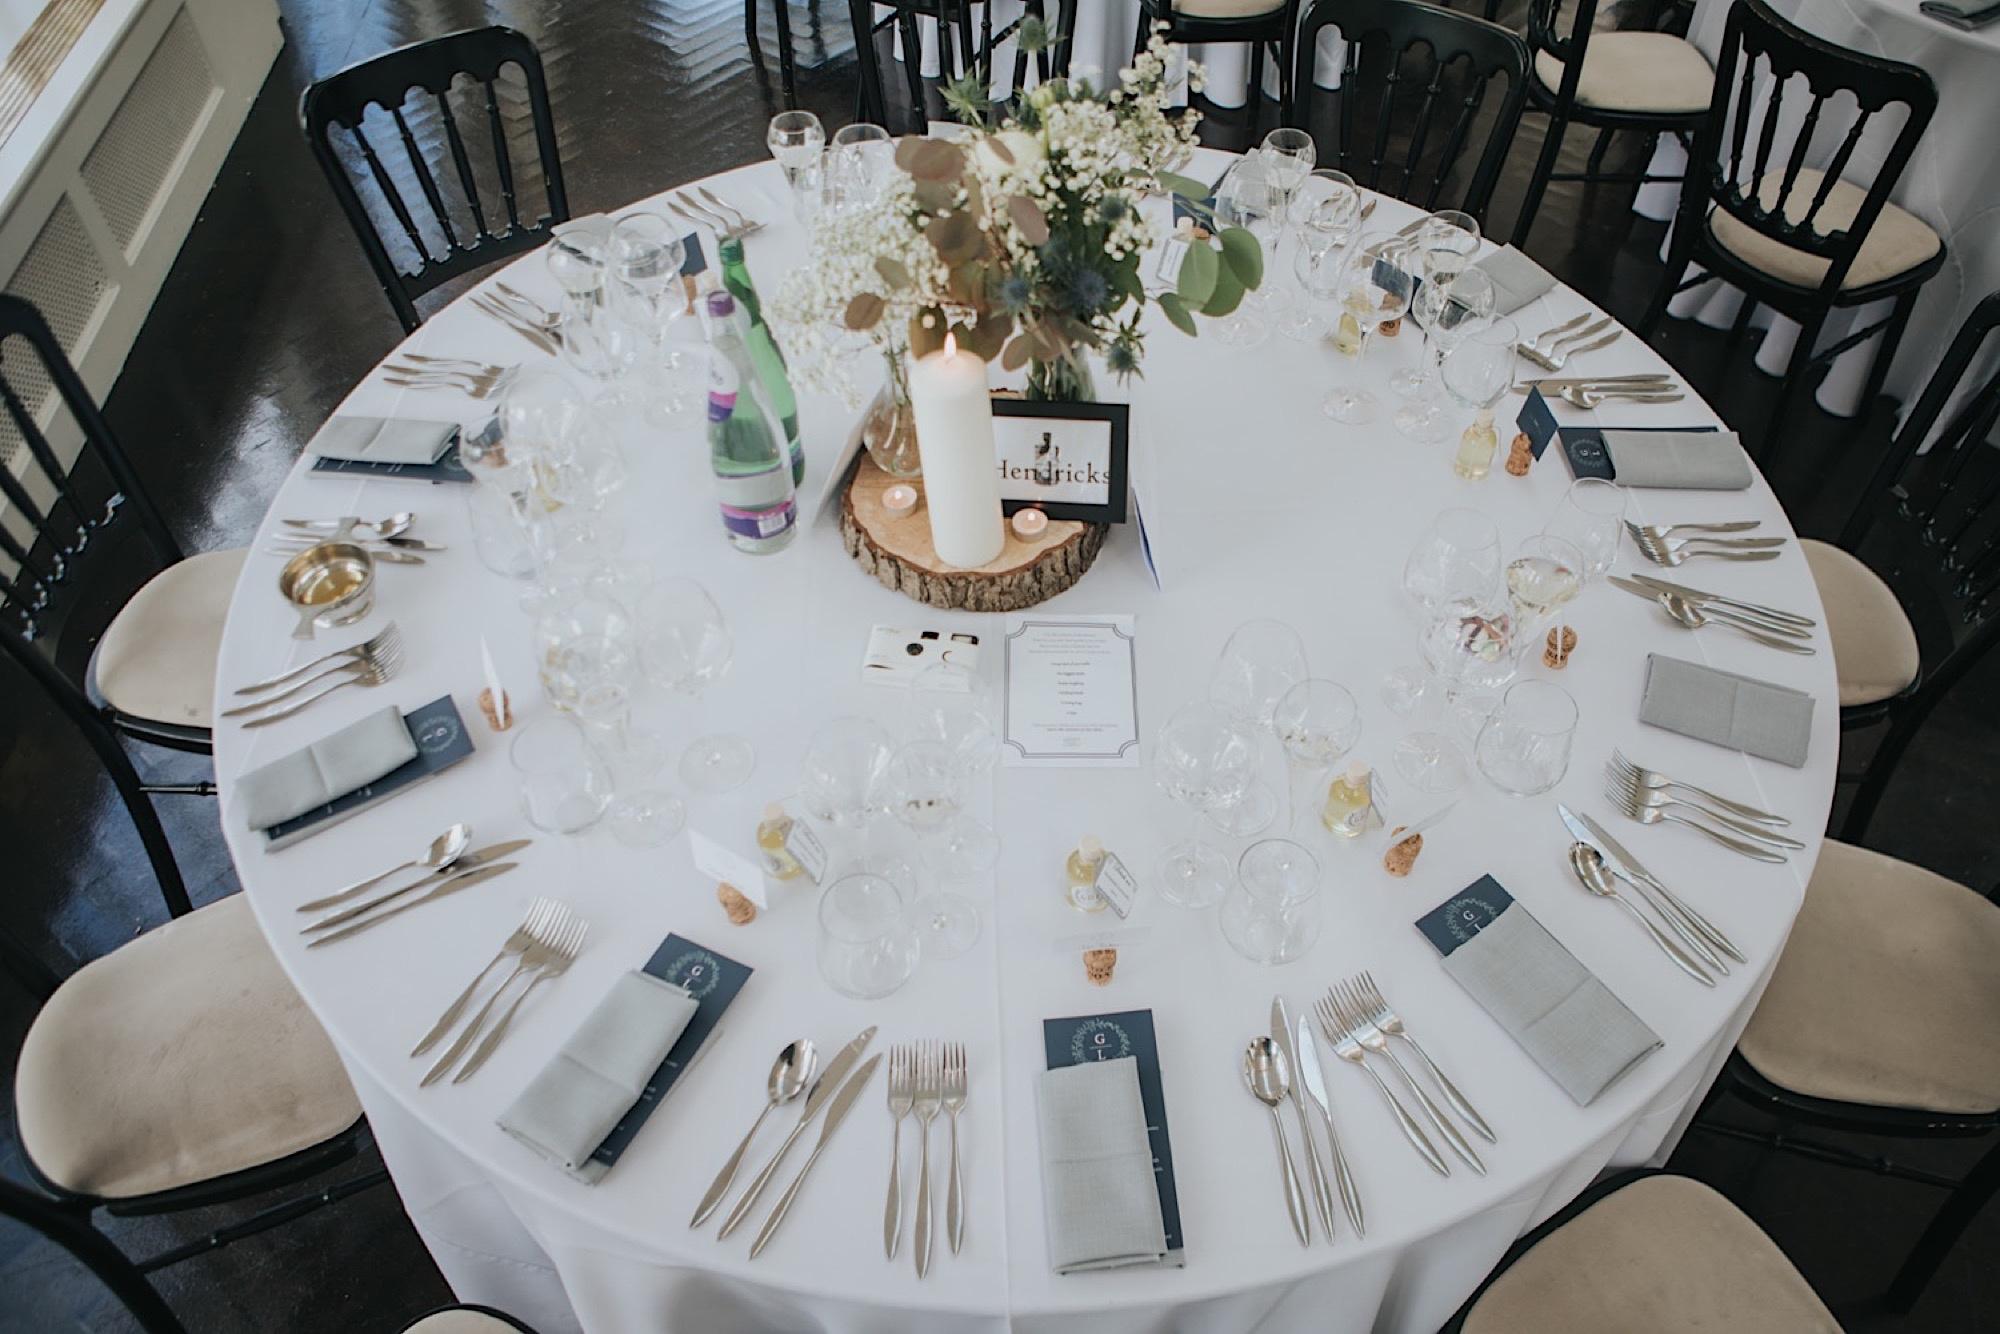 carlowrie castle wedding venue photos